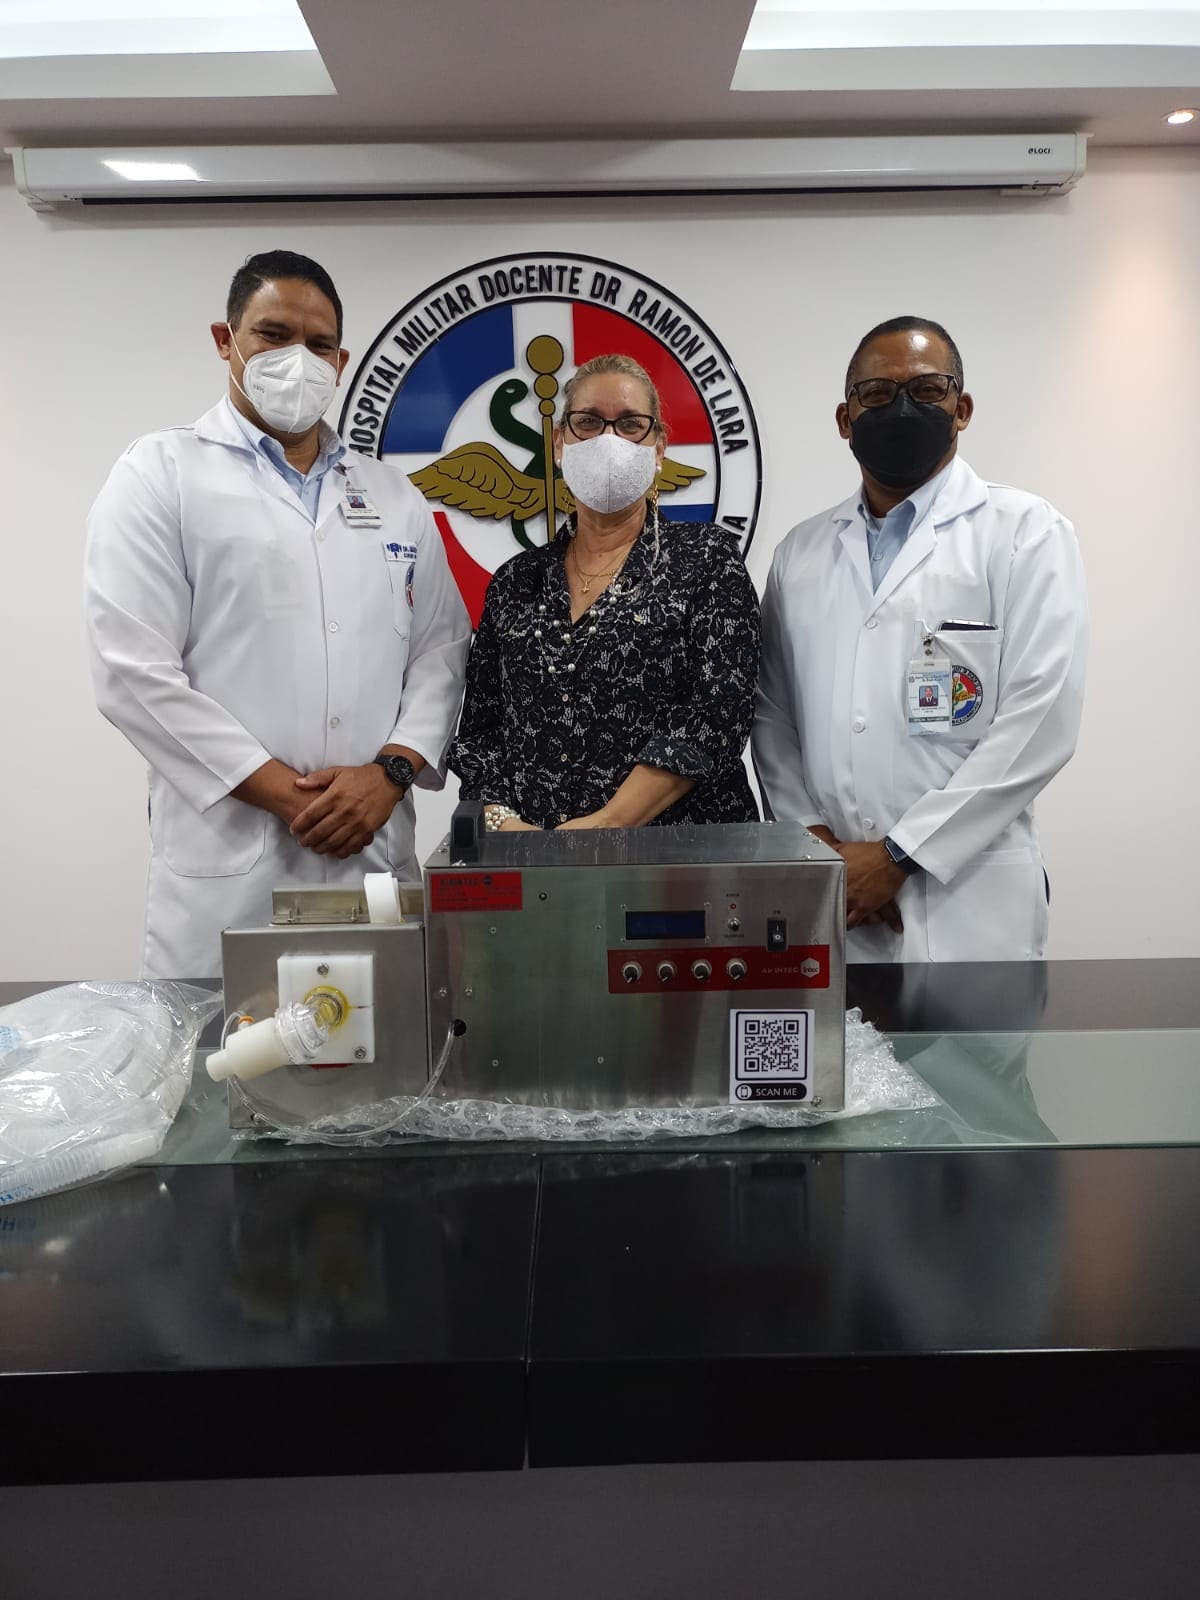 INTEC dona otros 5 ventiladores mecánicos al Hospital Dr. Ramón de Lara